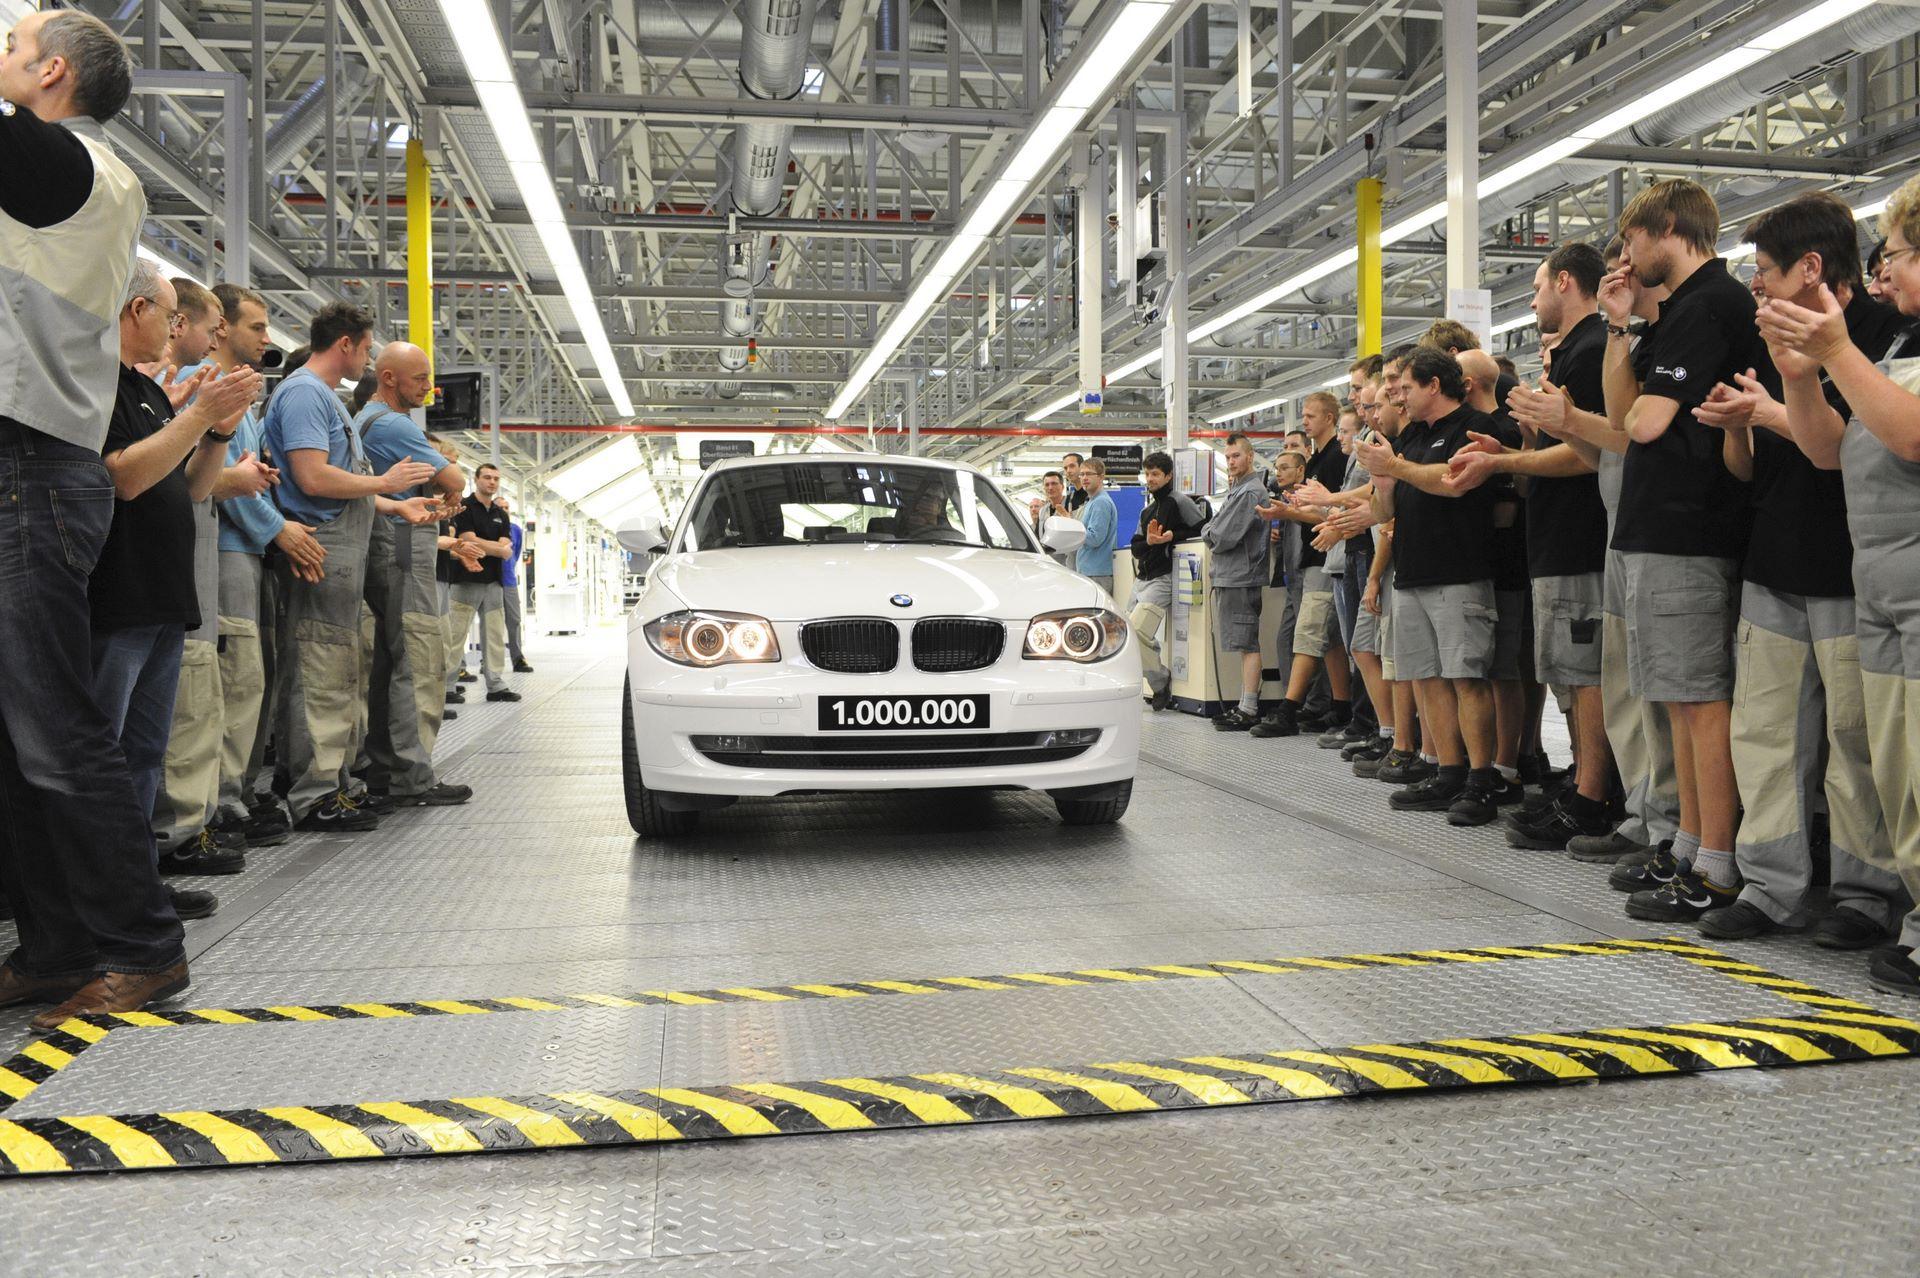 Foto: BMW AG / Fotograf: Martin Klindtworth - Einmillionster BMW aus Leipzig - 09.12.2011